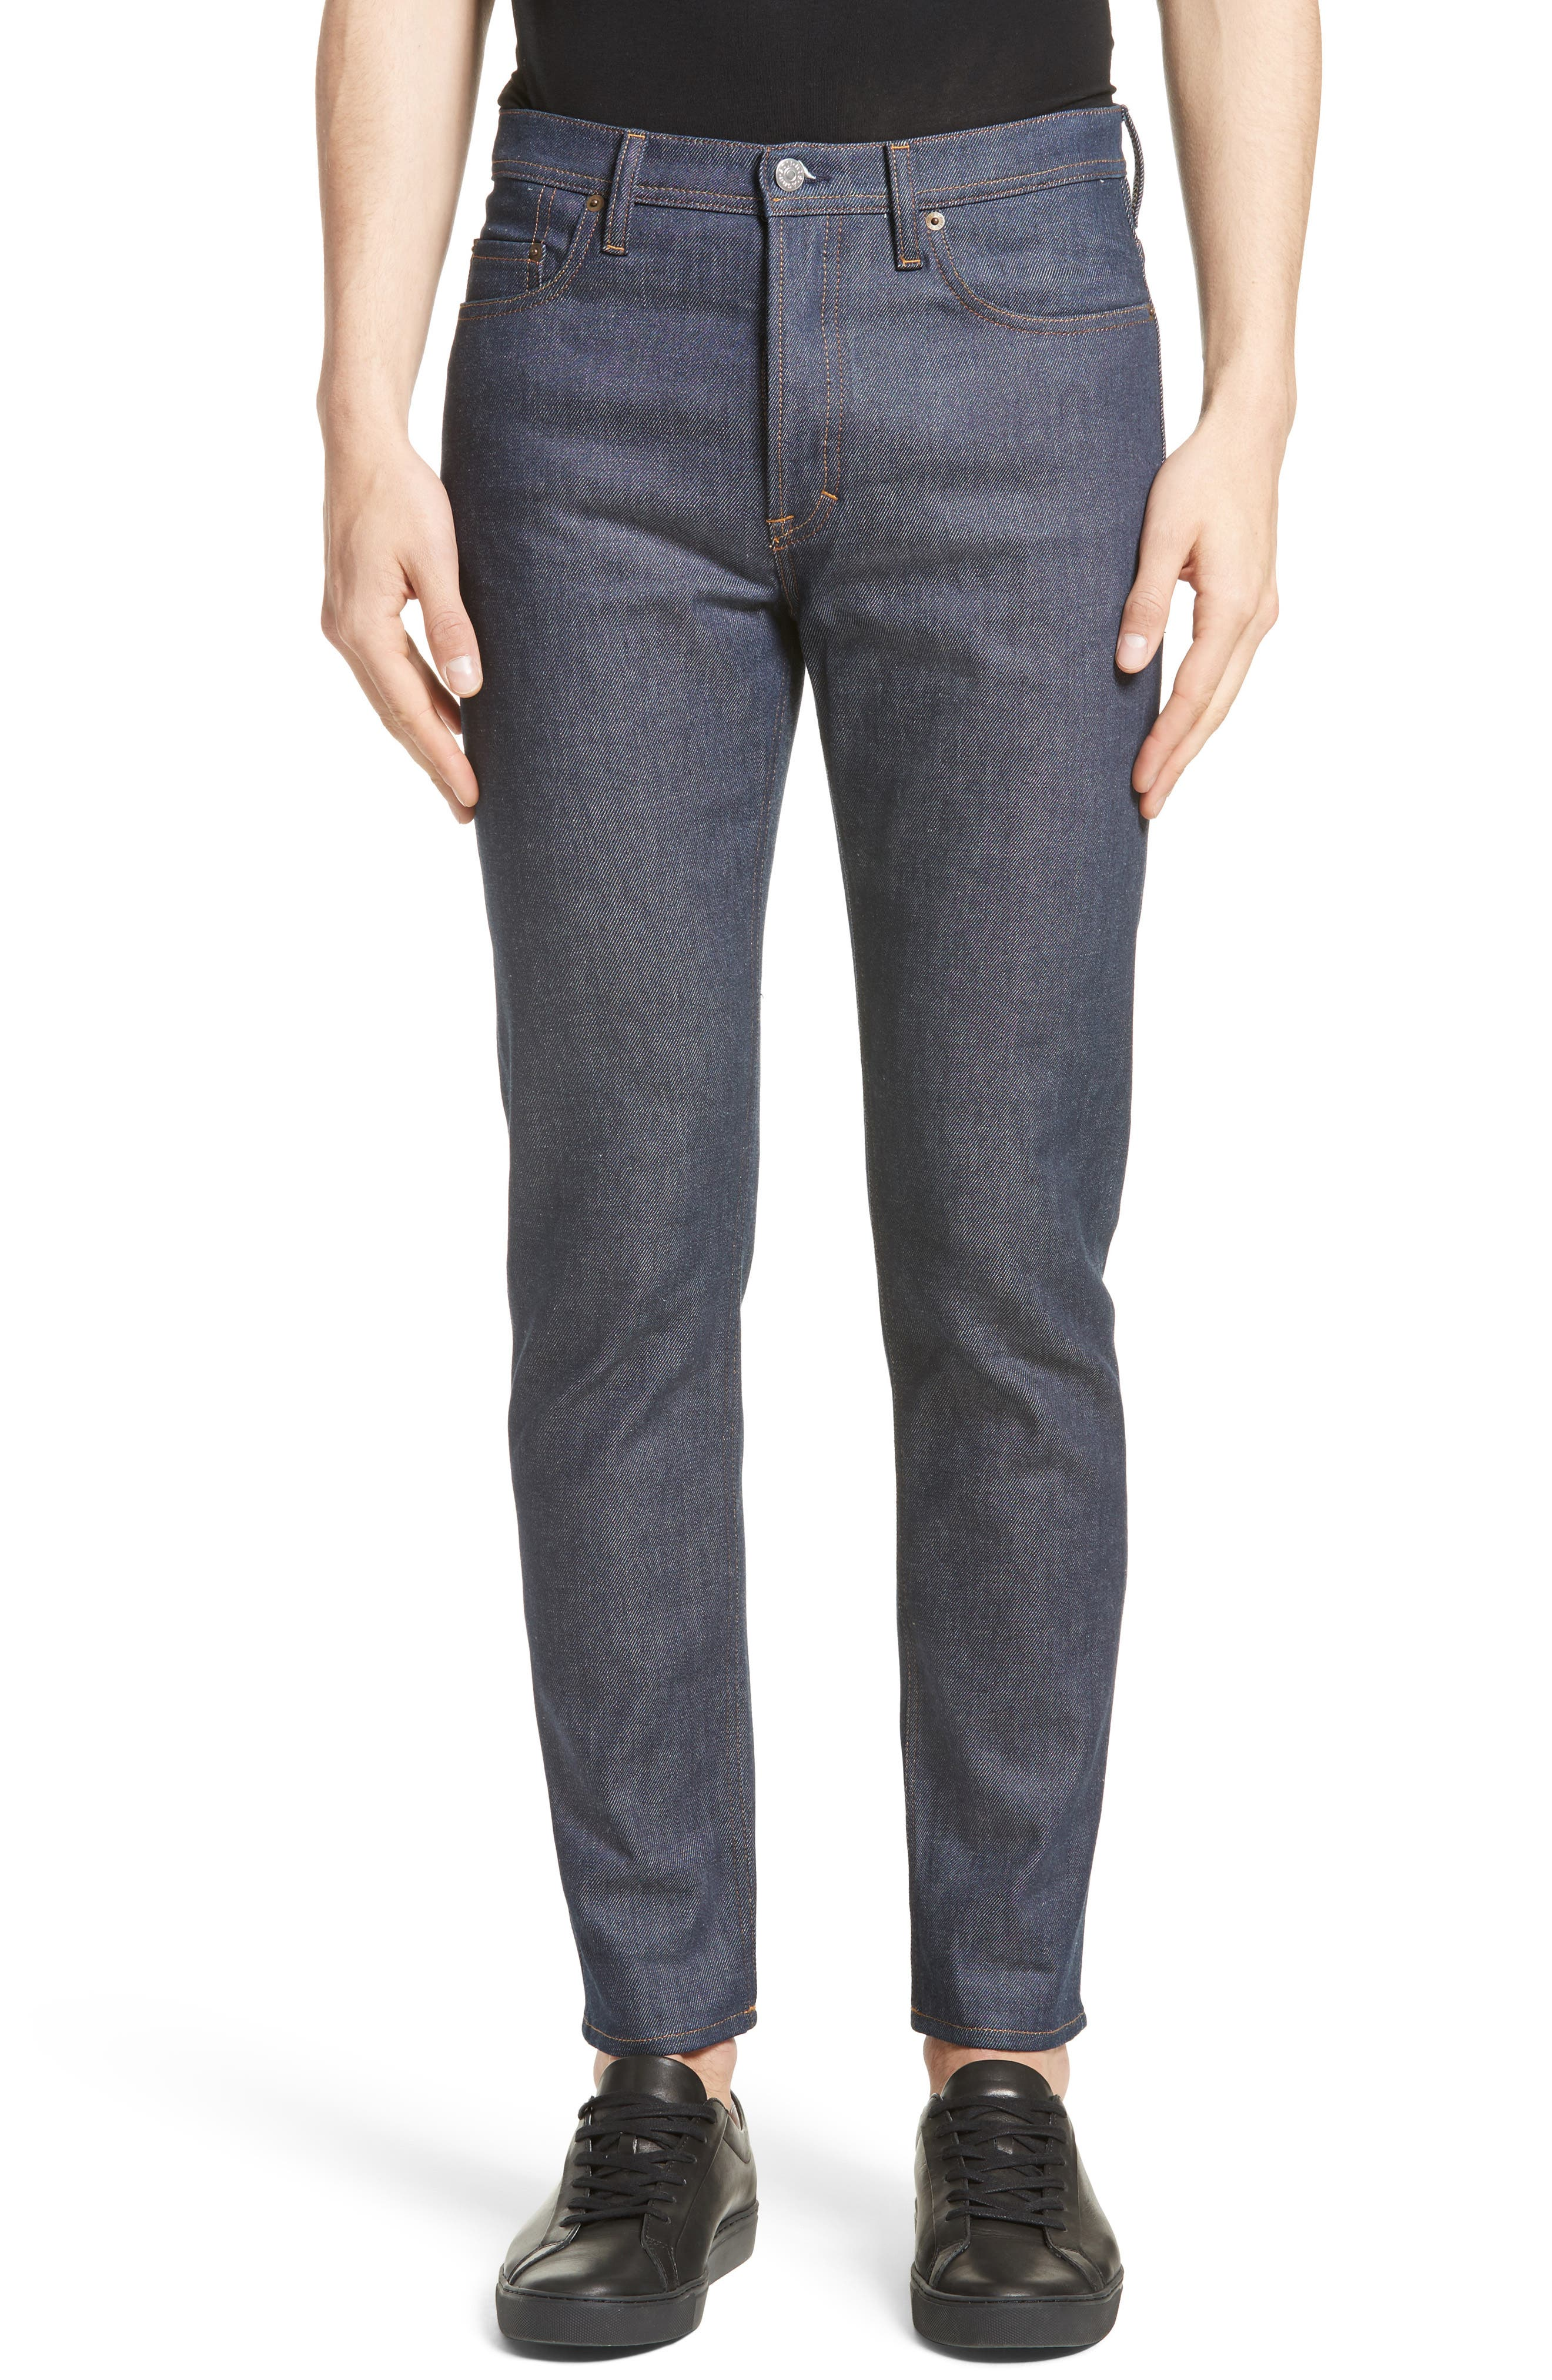 Alternate Image 1 Selected - ACNE Studios River Slim Tapered Leg Jeans